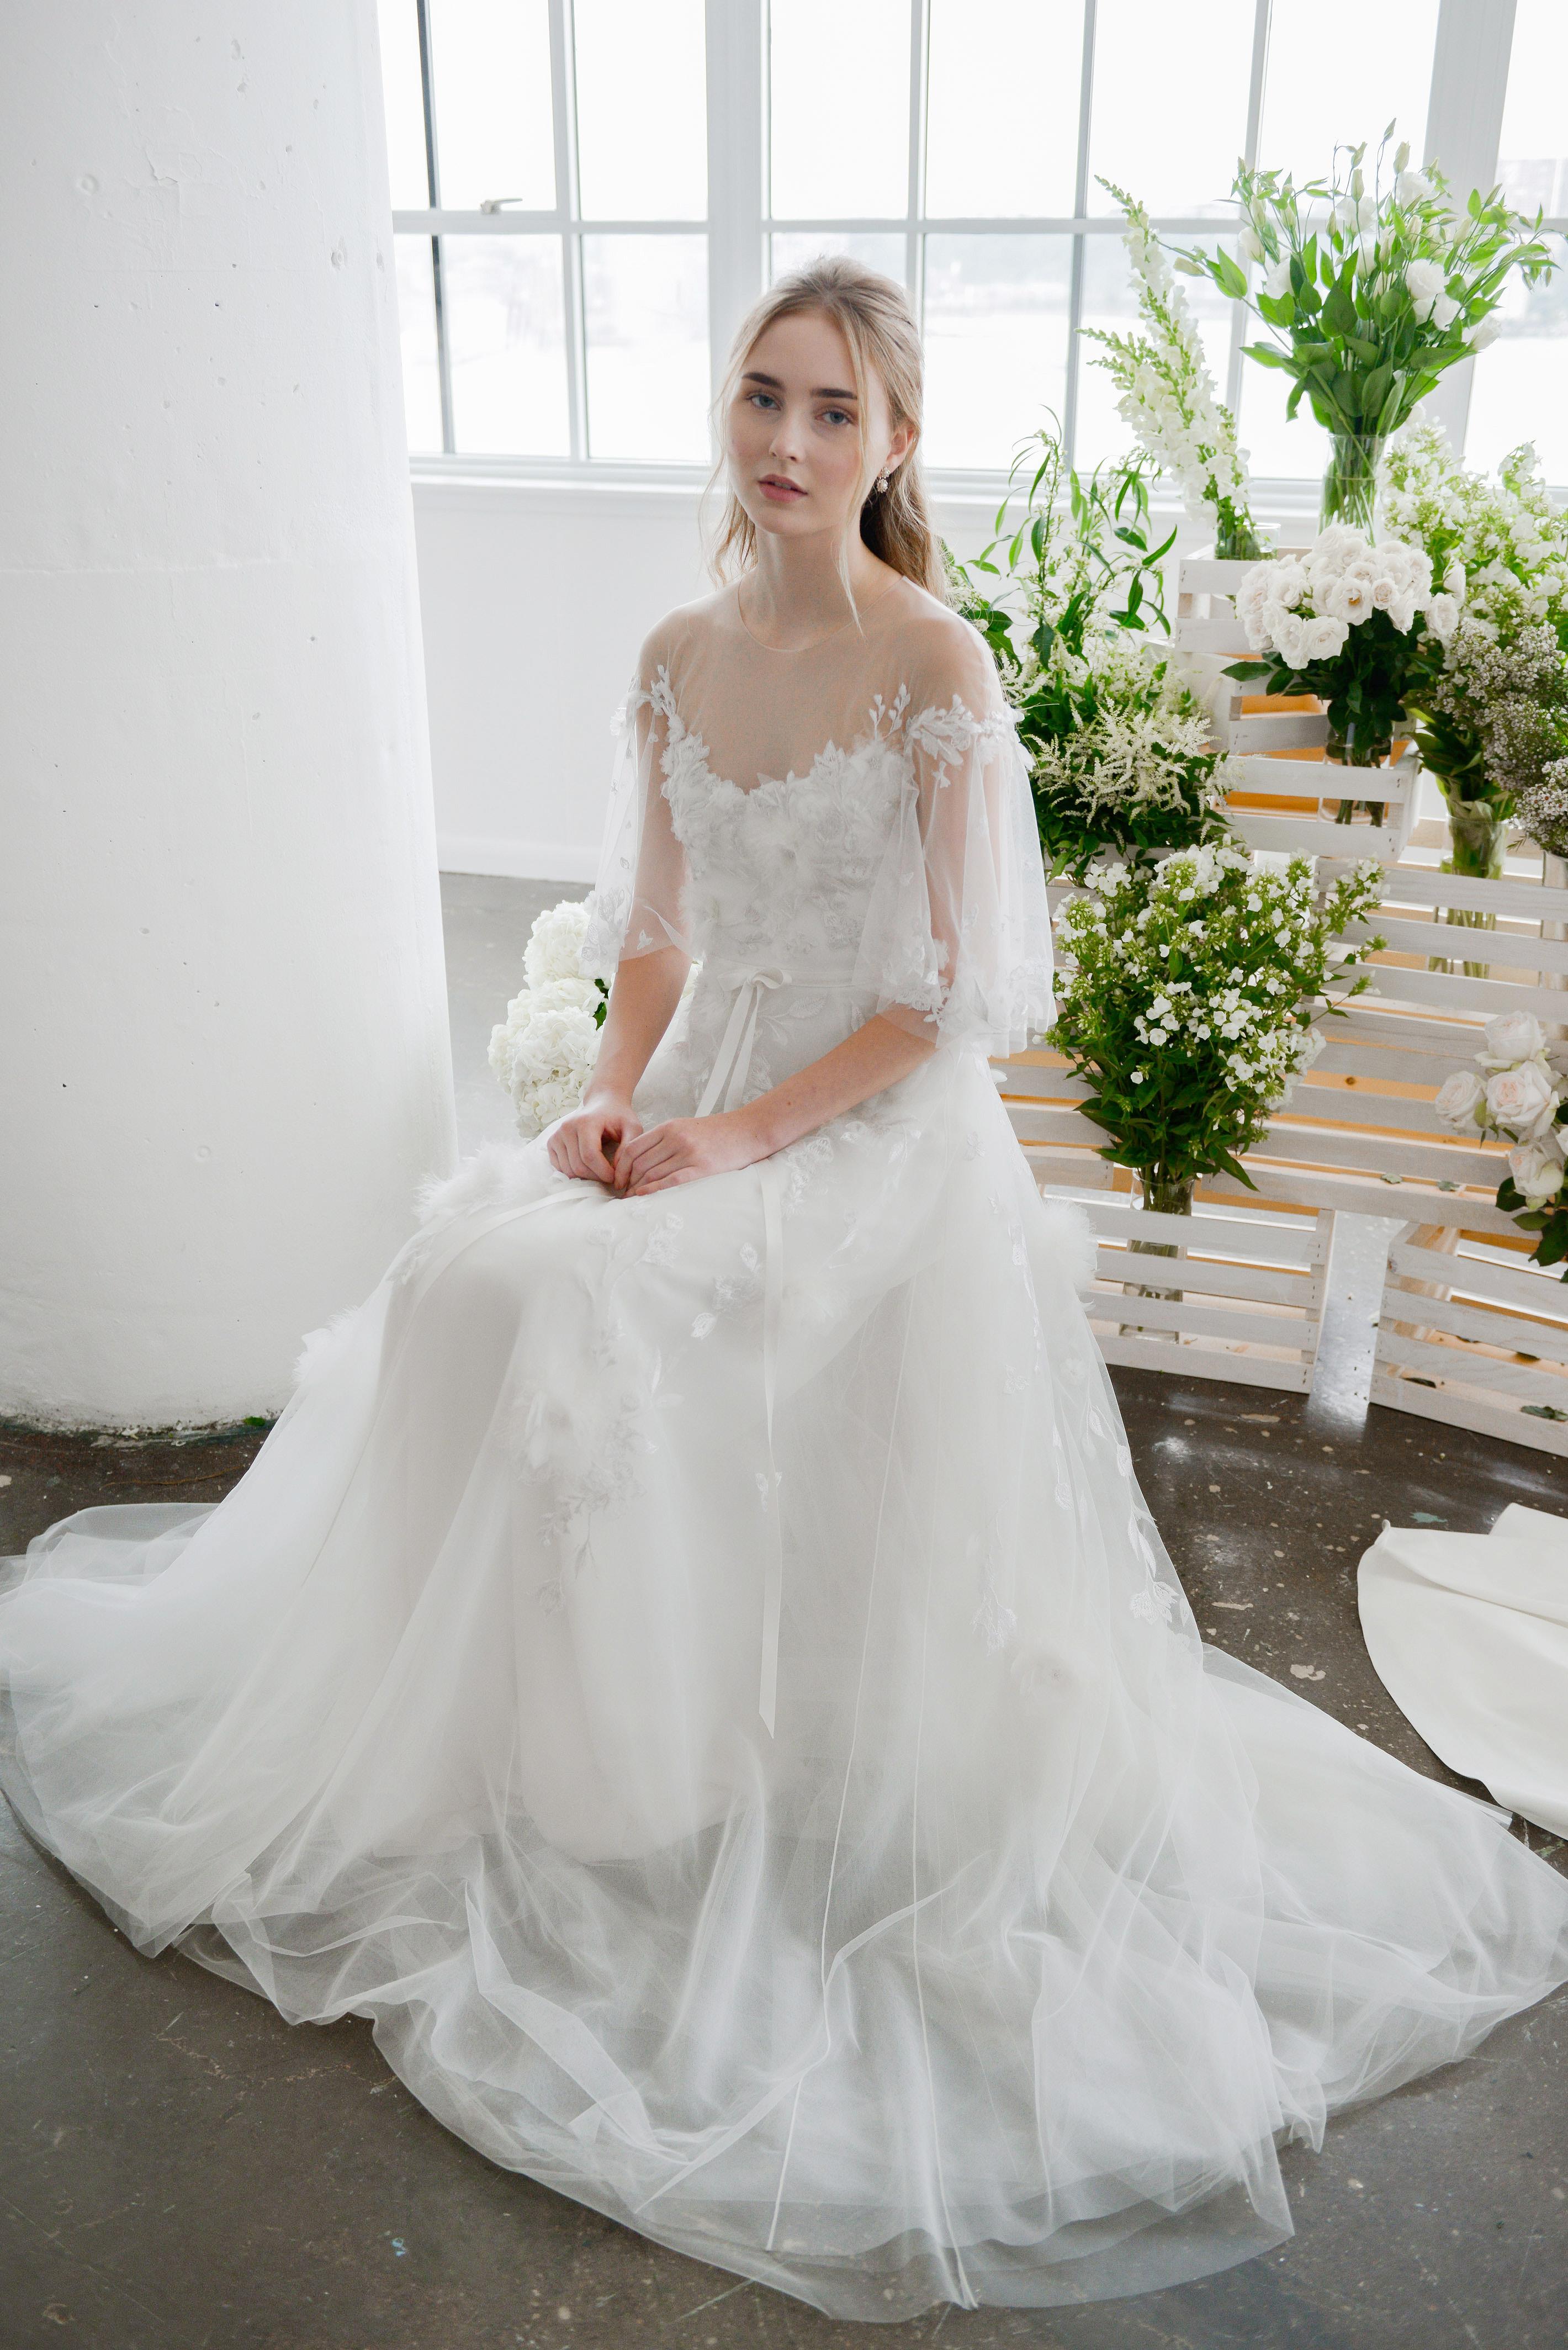 marchesa notte high sheer neckline bridal wedding dress with three-quarter length sleeves fall 2018